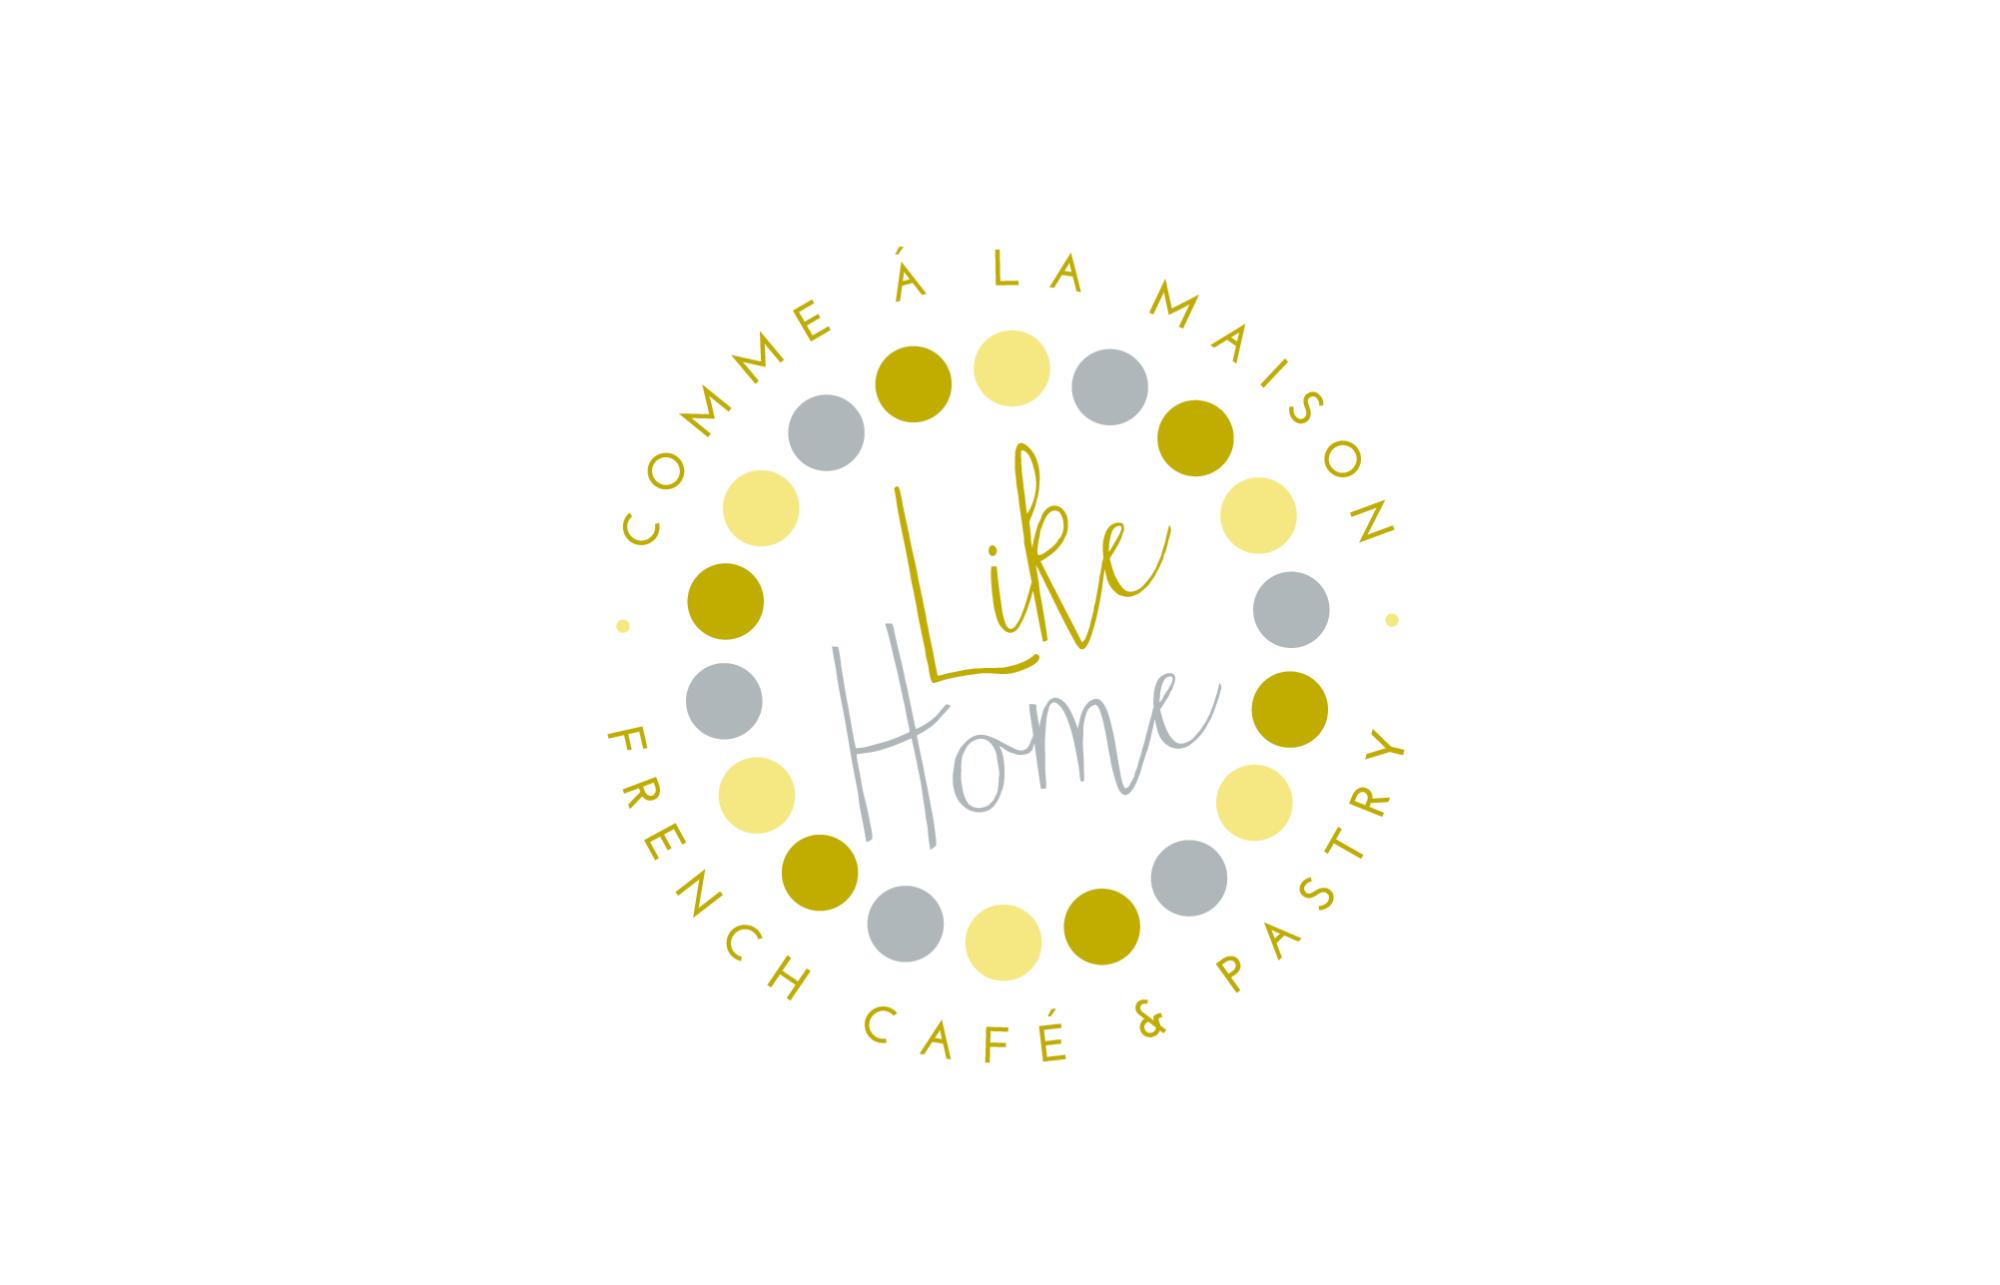 LikeHome-logo-design